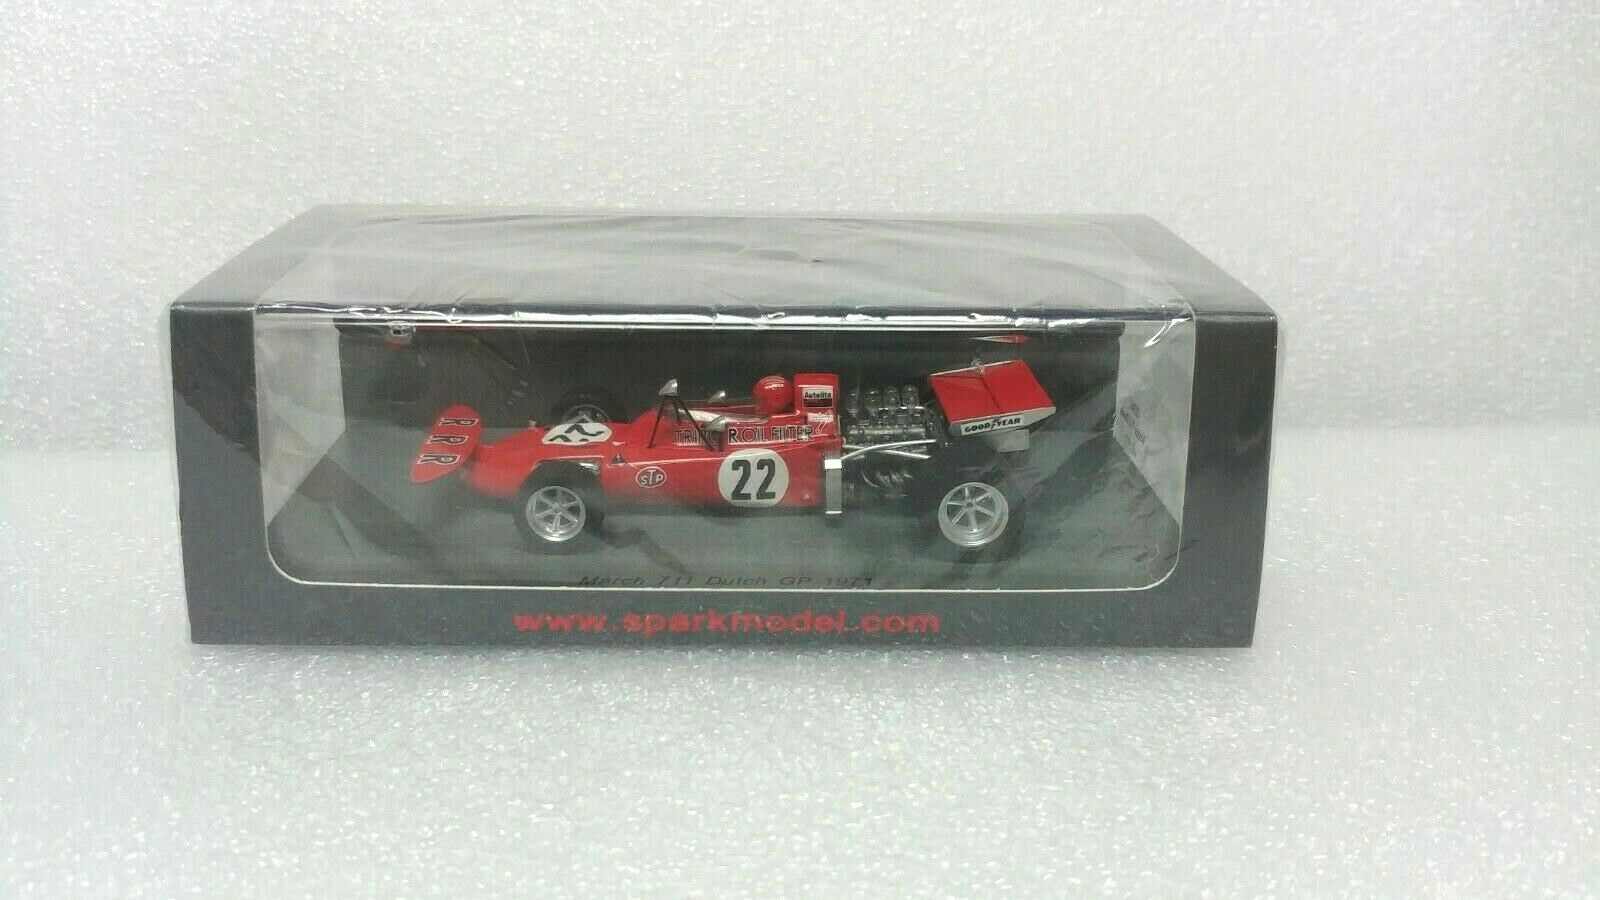 March 711 No.22 Dutch GP 1971 Skip Barber SPARK MODEL 1 43  S5361